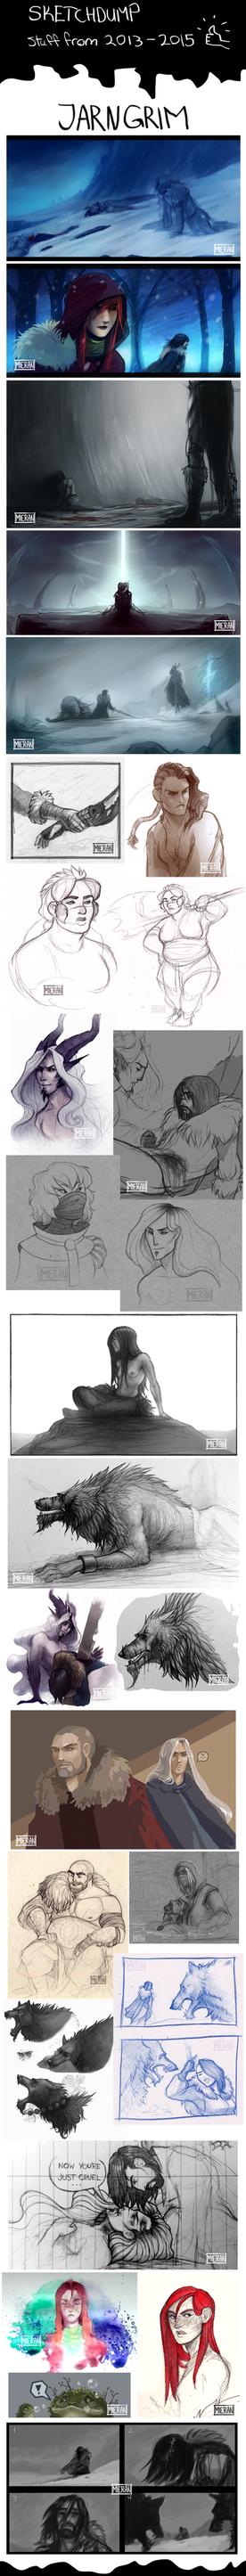 JARNGRIM Sketchdump 2013 - 2015 by TheSnowDragon